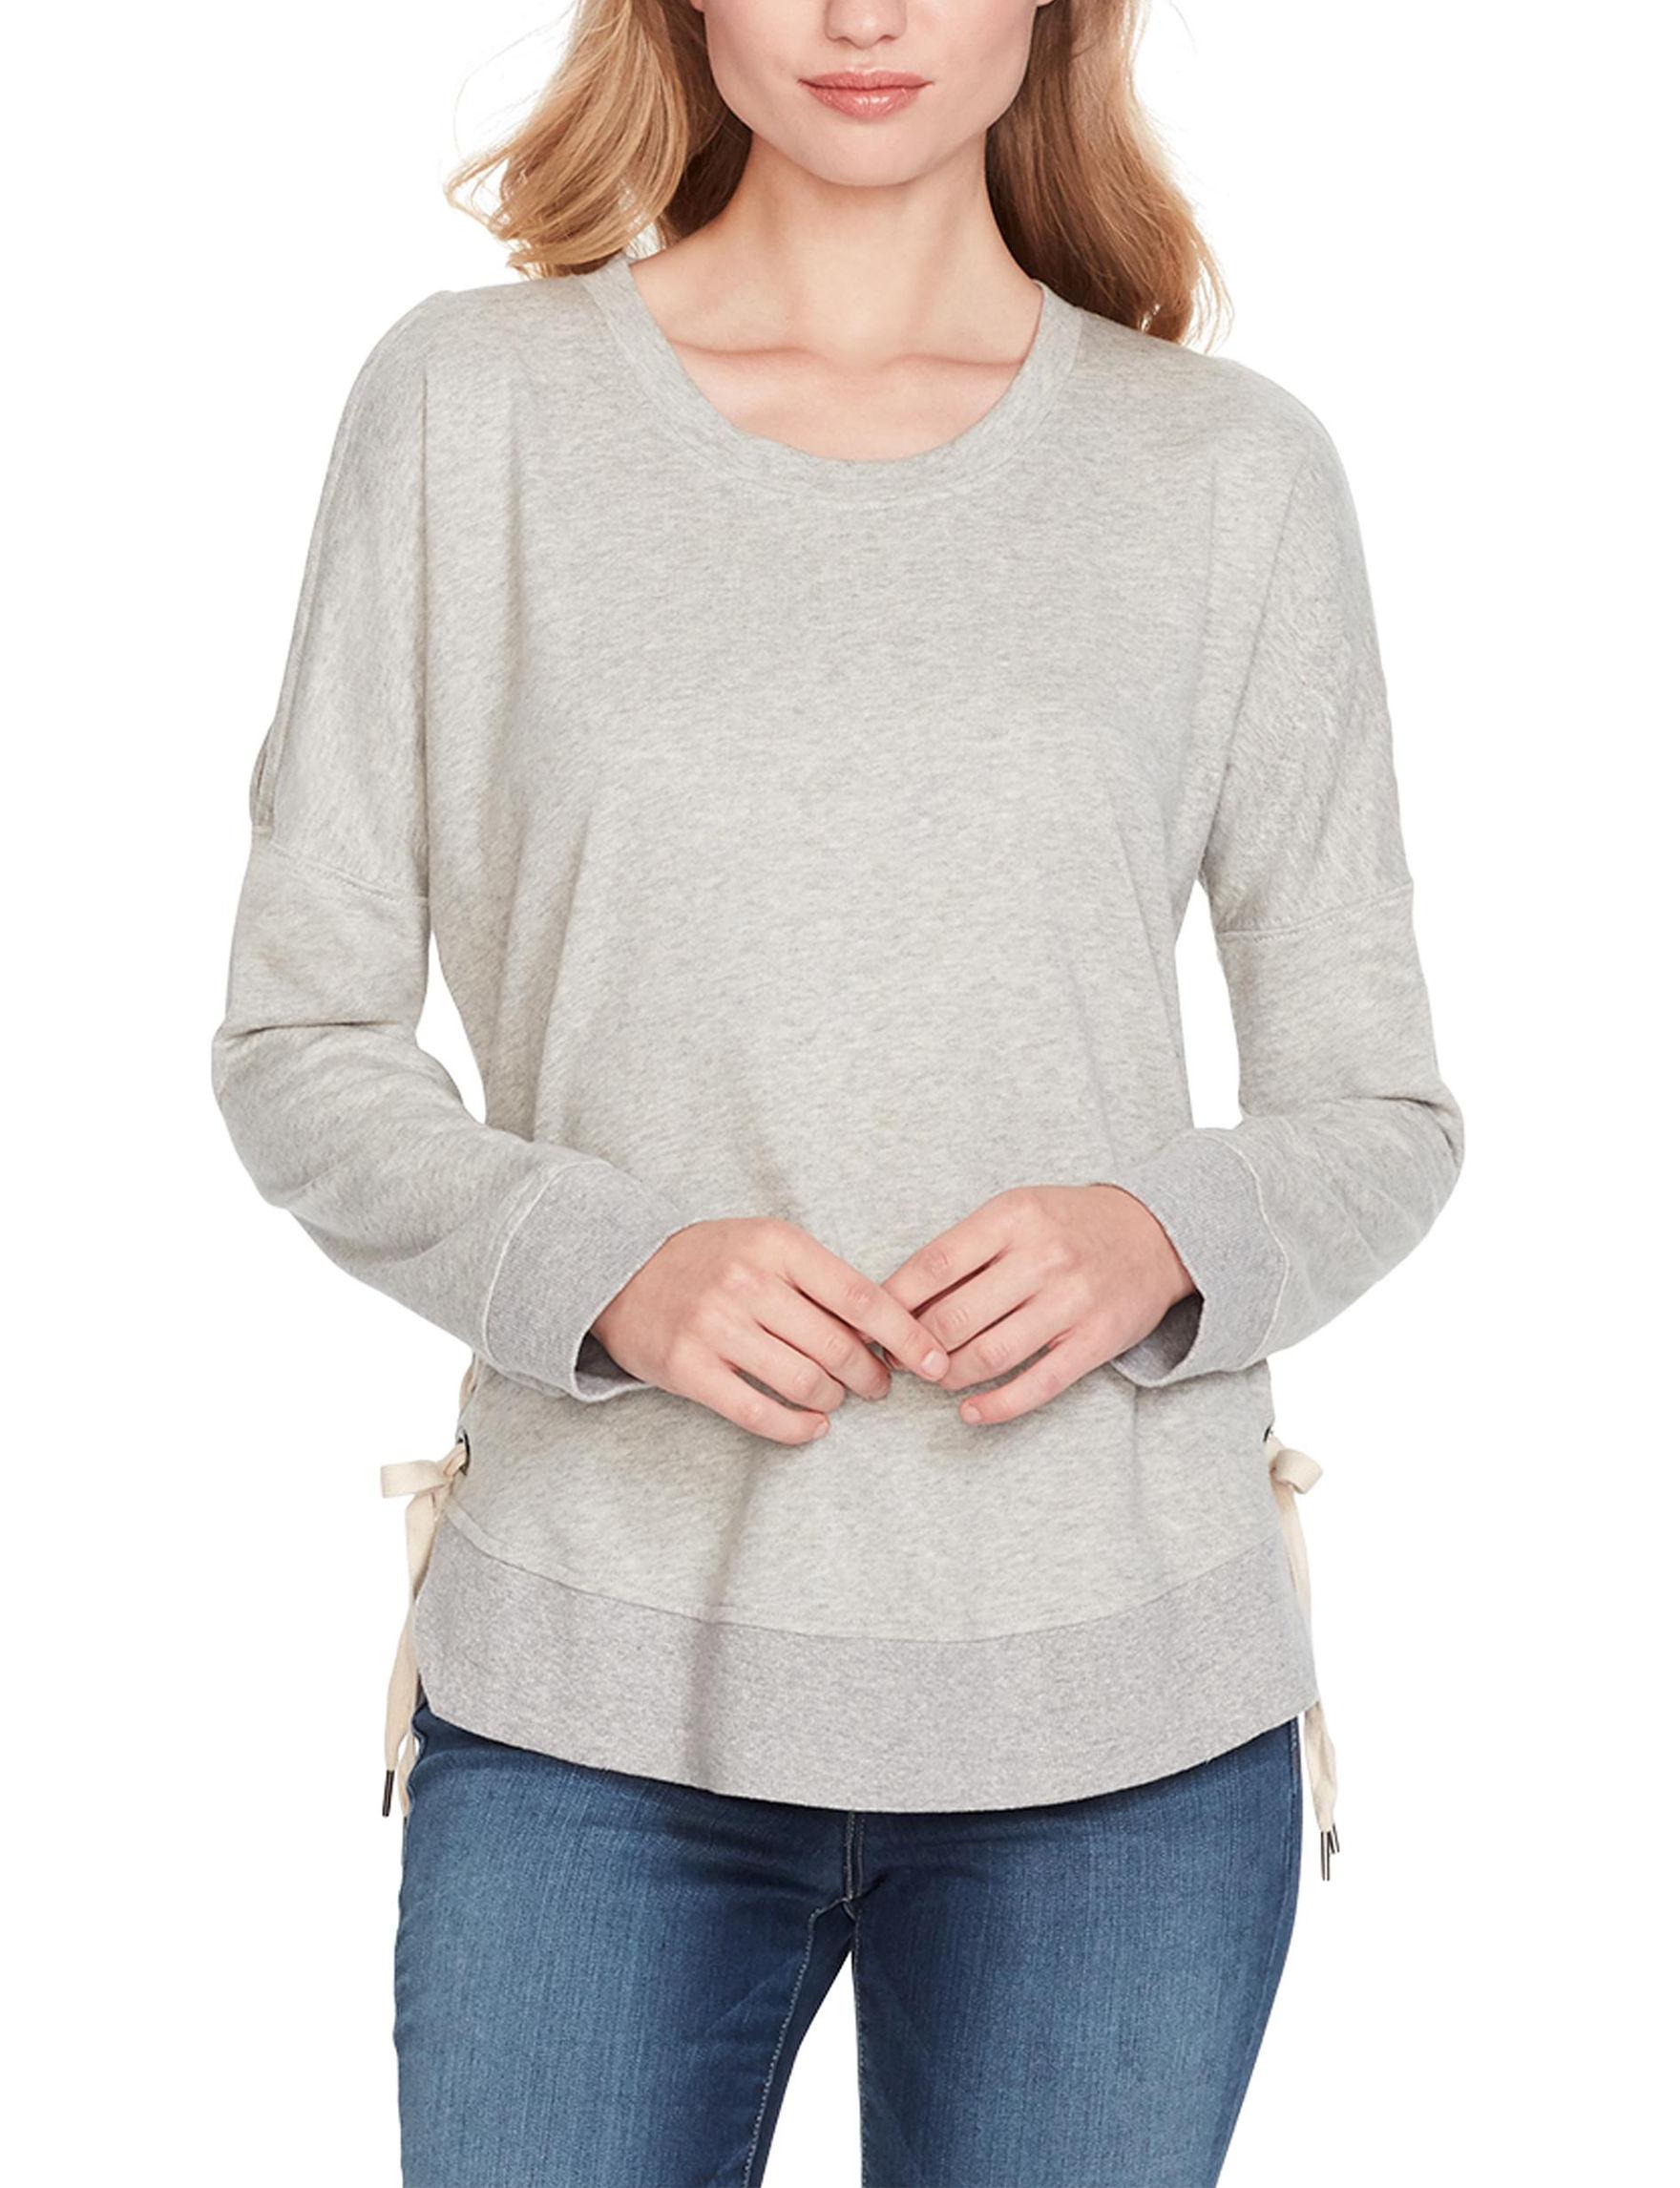 Jessica Simpson Light Grey Shirts & Blouses